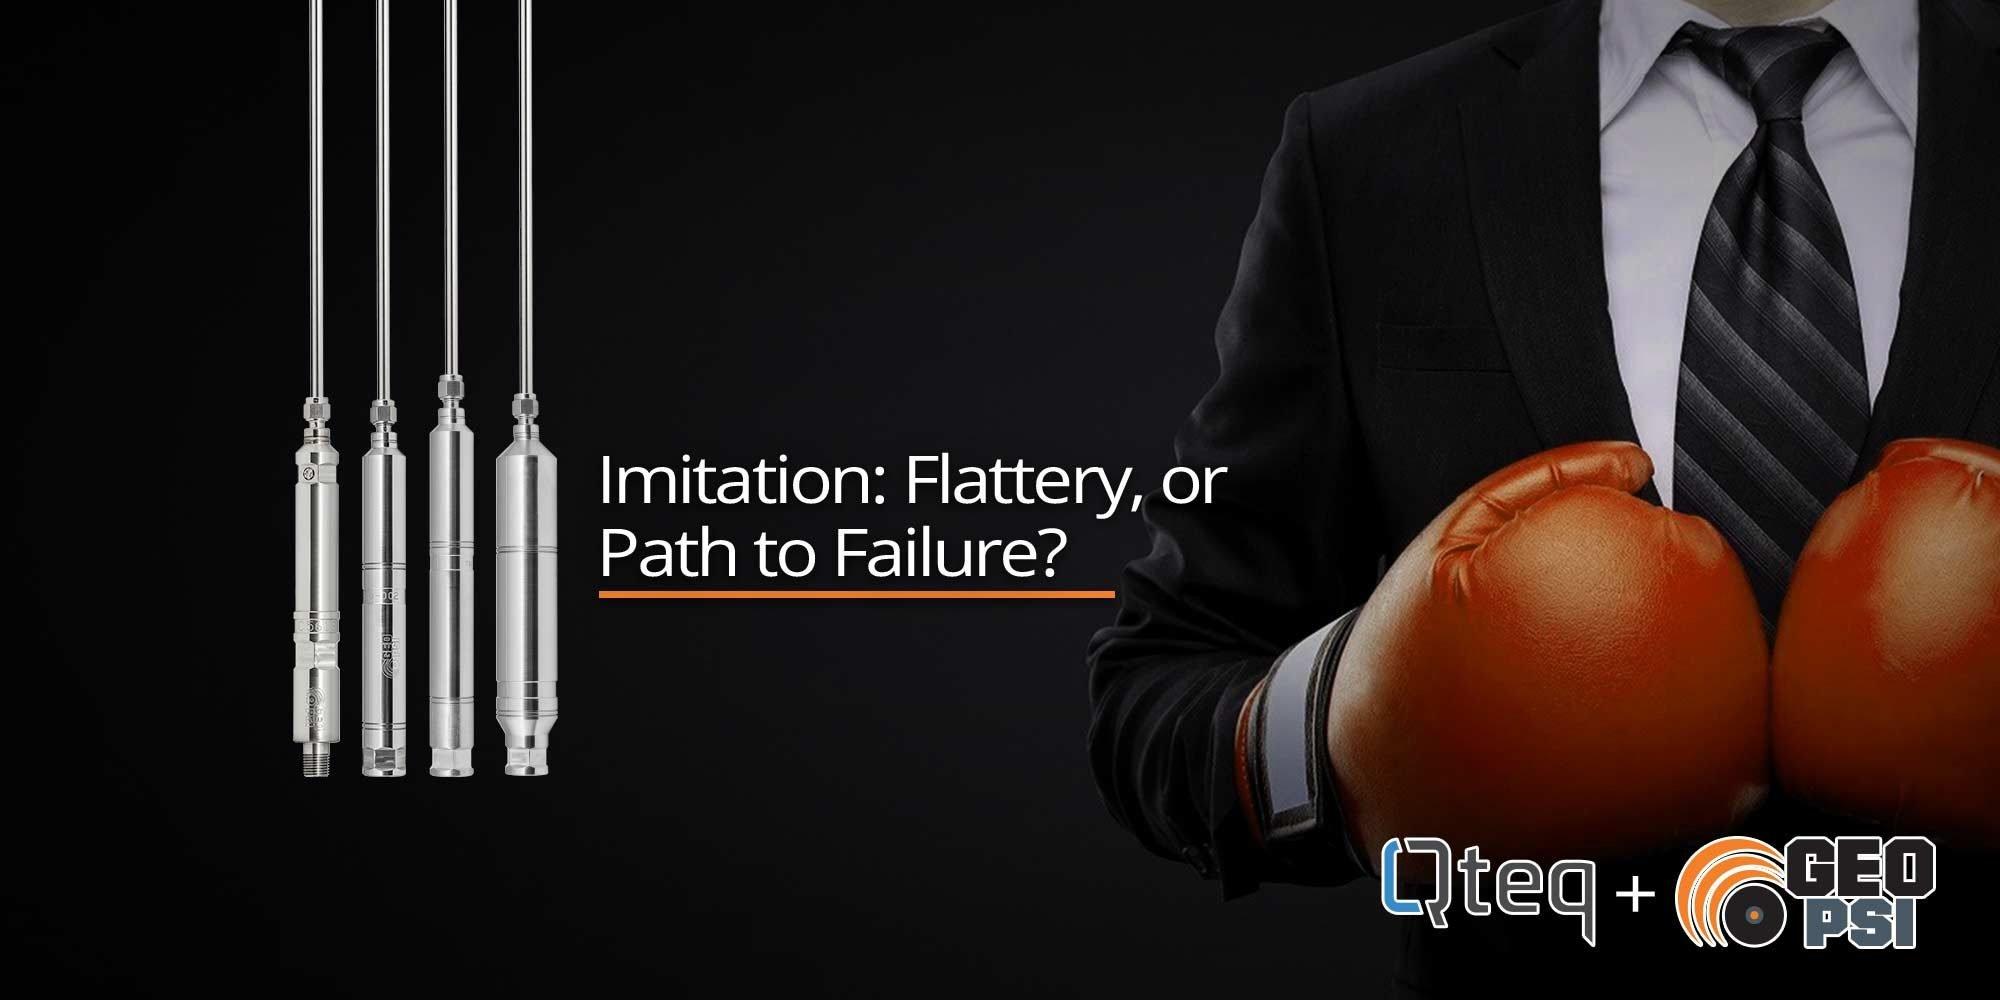 Imitation: Flattery, or Path to Failure?